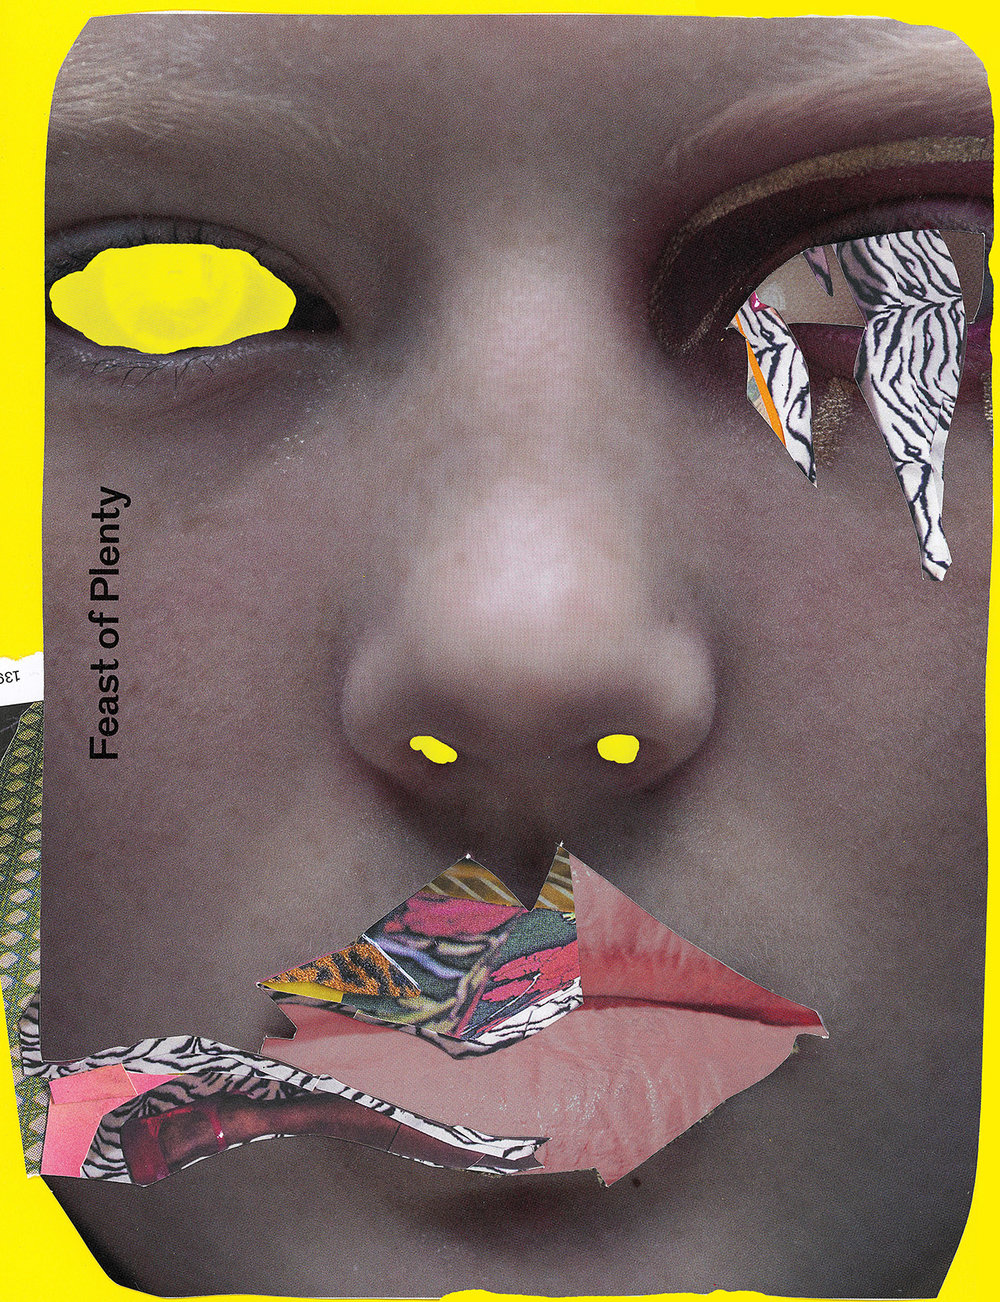 Lippy, 16''x20'' pigment print